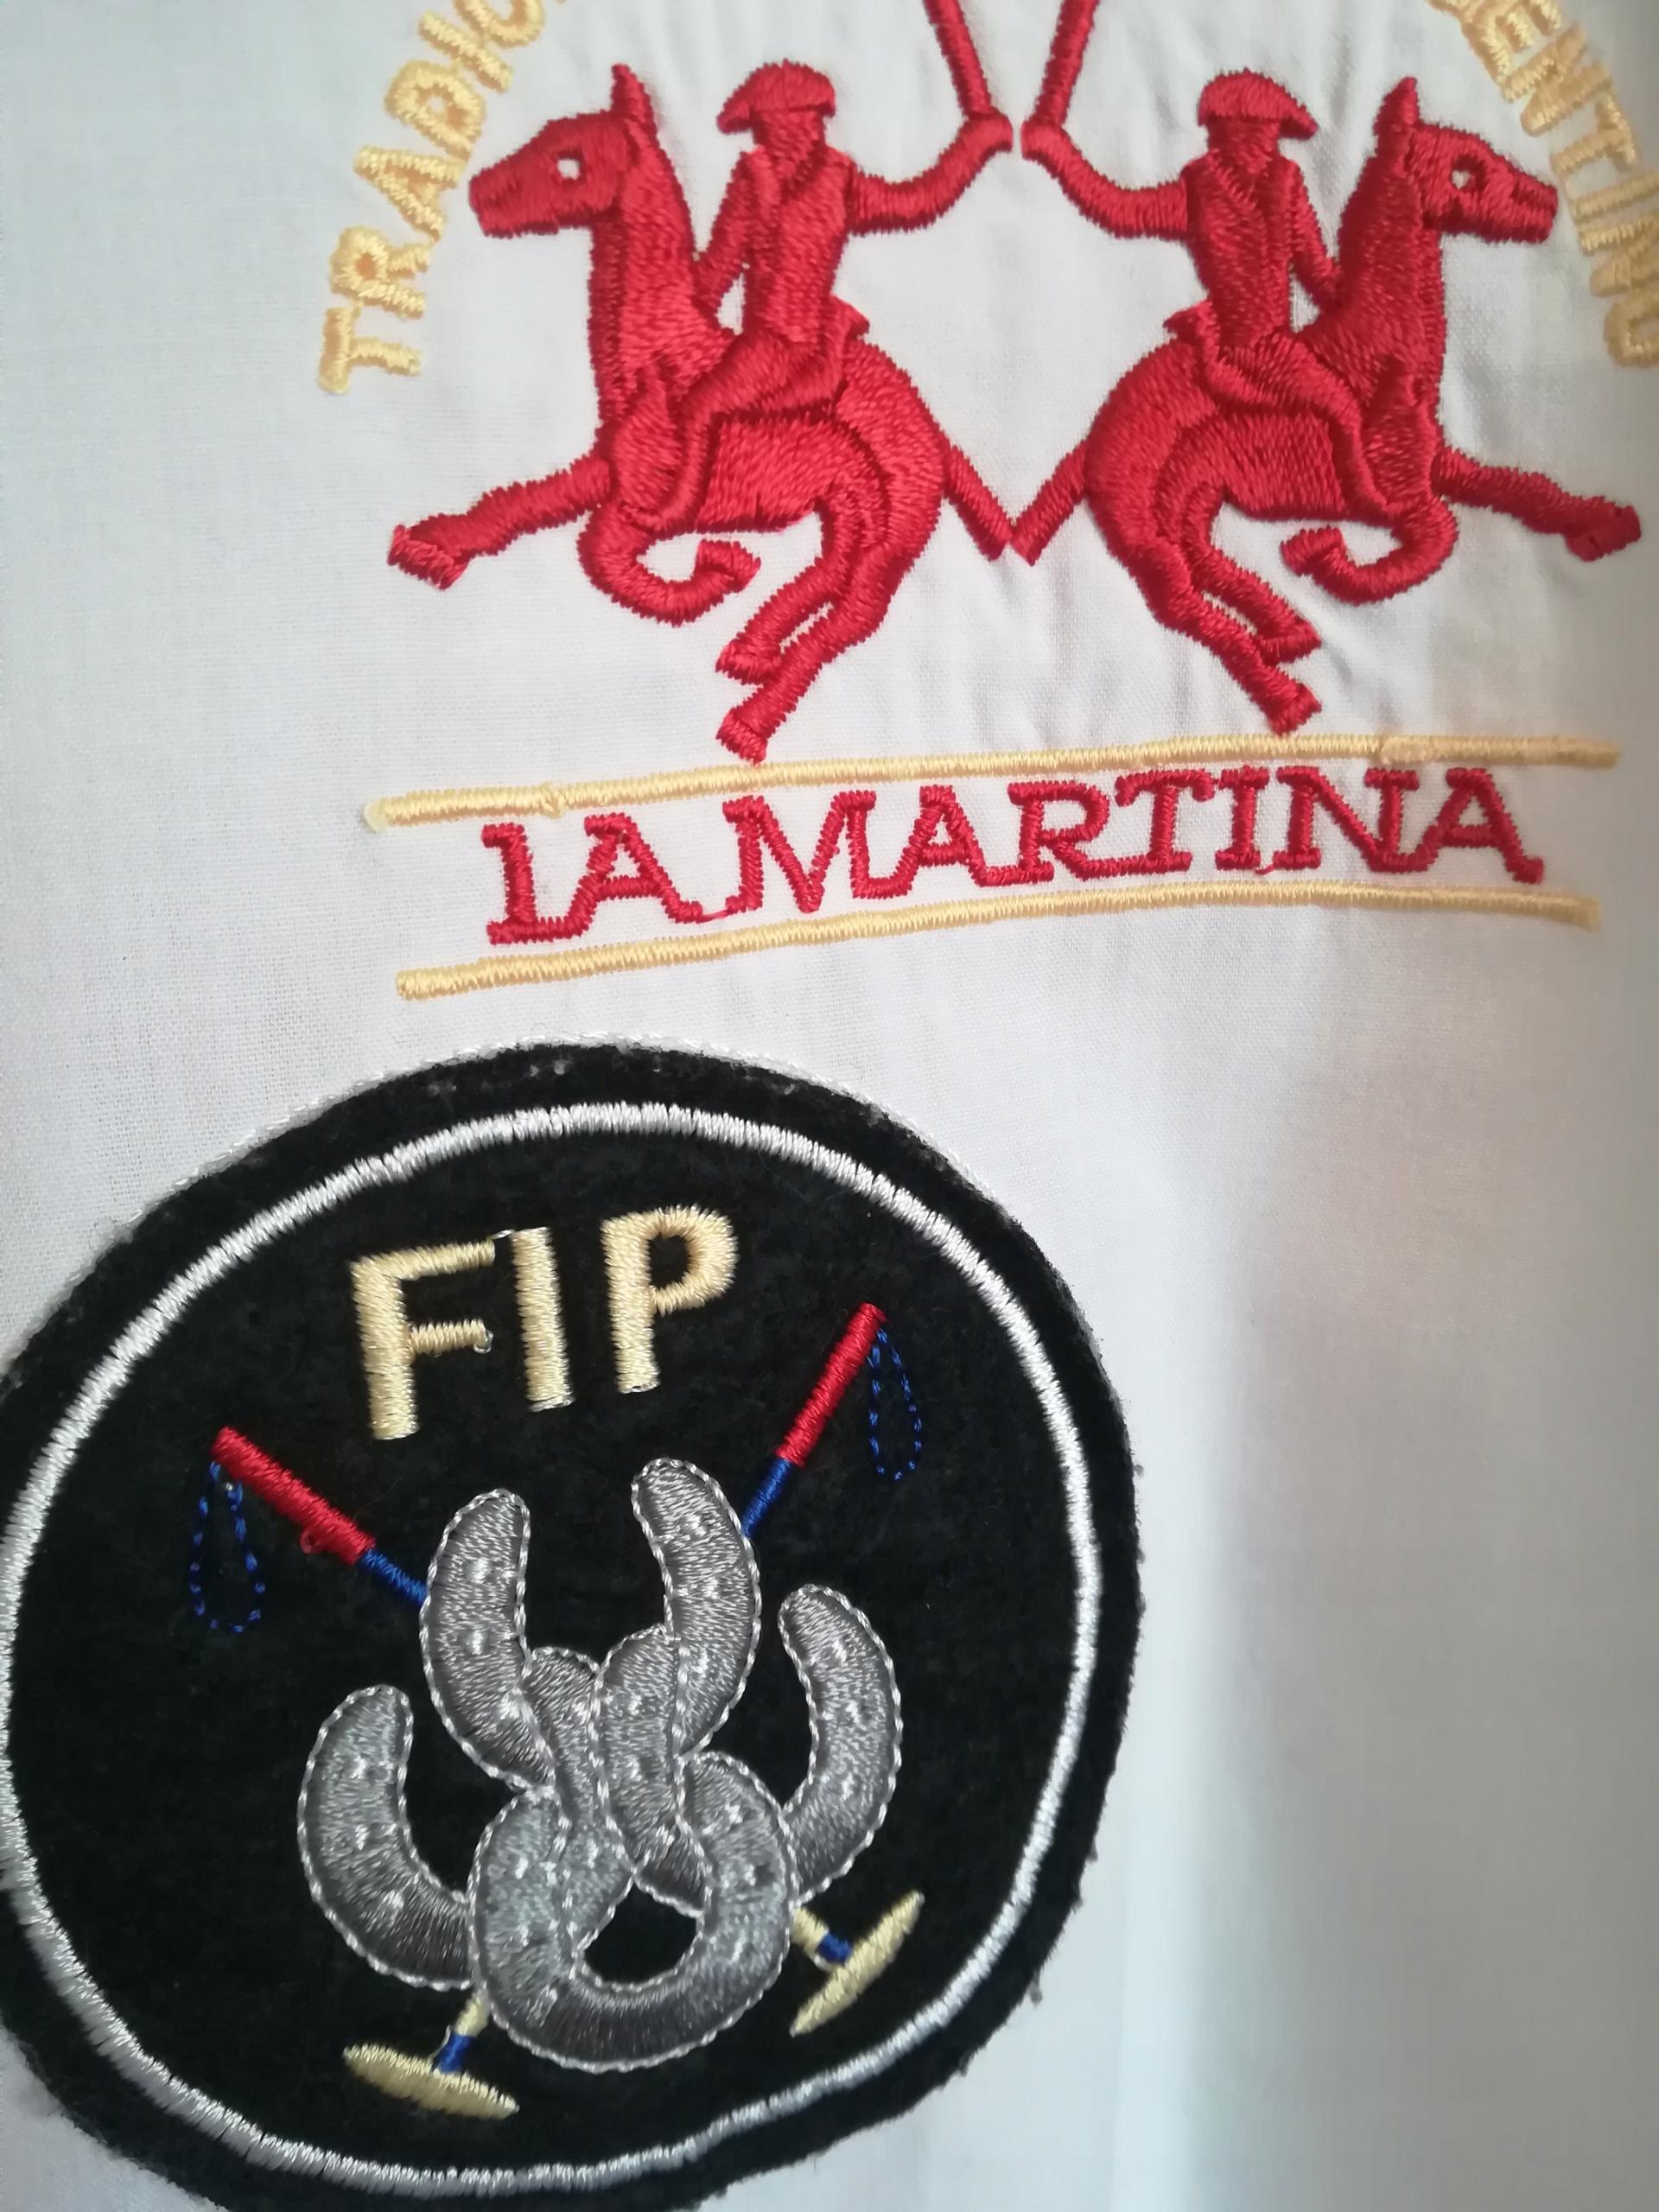 La Martina elegancka koszula męska XL